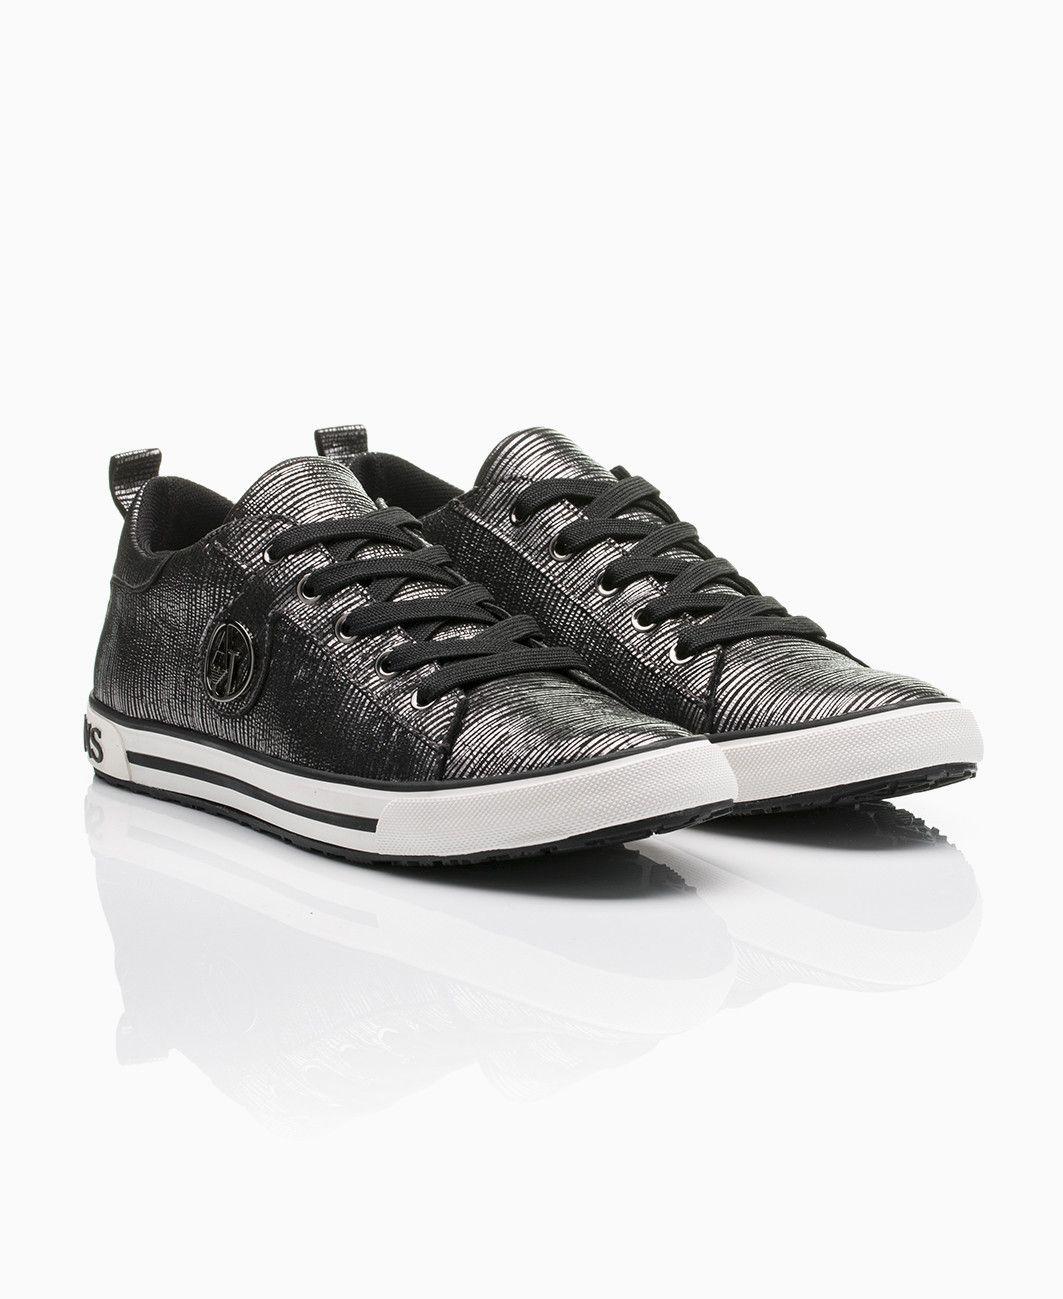 ec23e15d49 Armani Jeans - Glitter Suede Lo Trainers - Gunmetal - Shoes   Trainers -  Womens